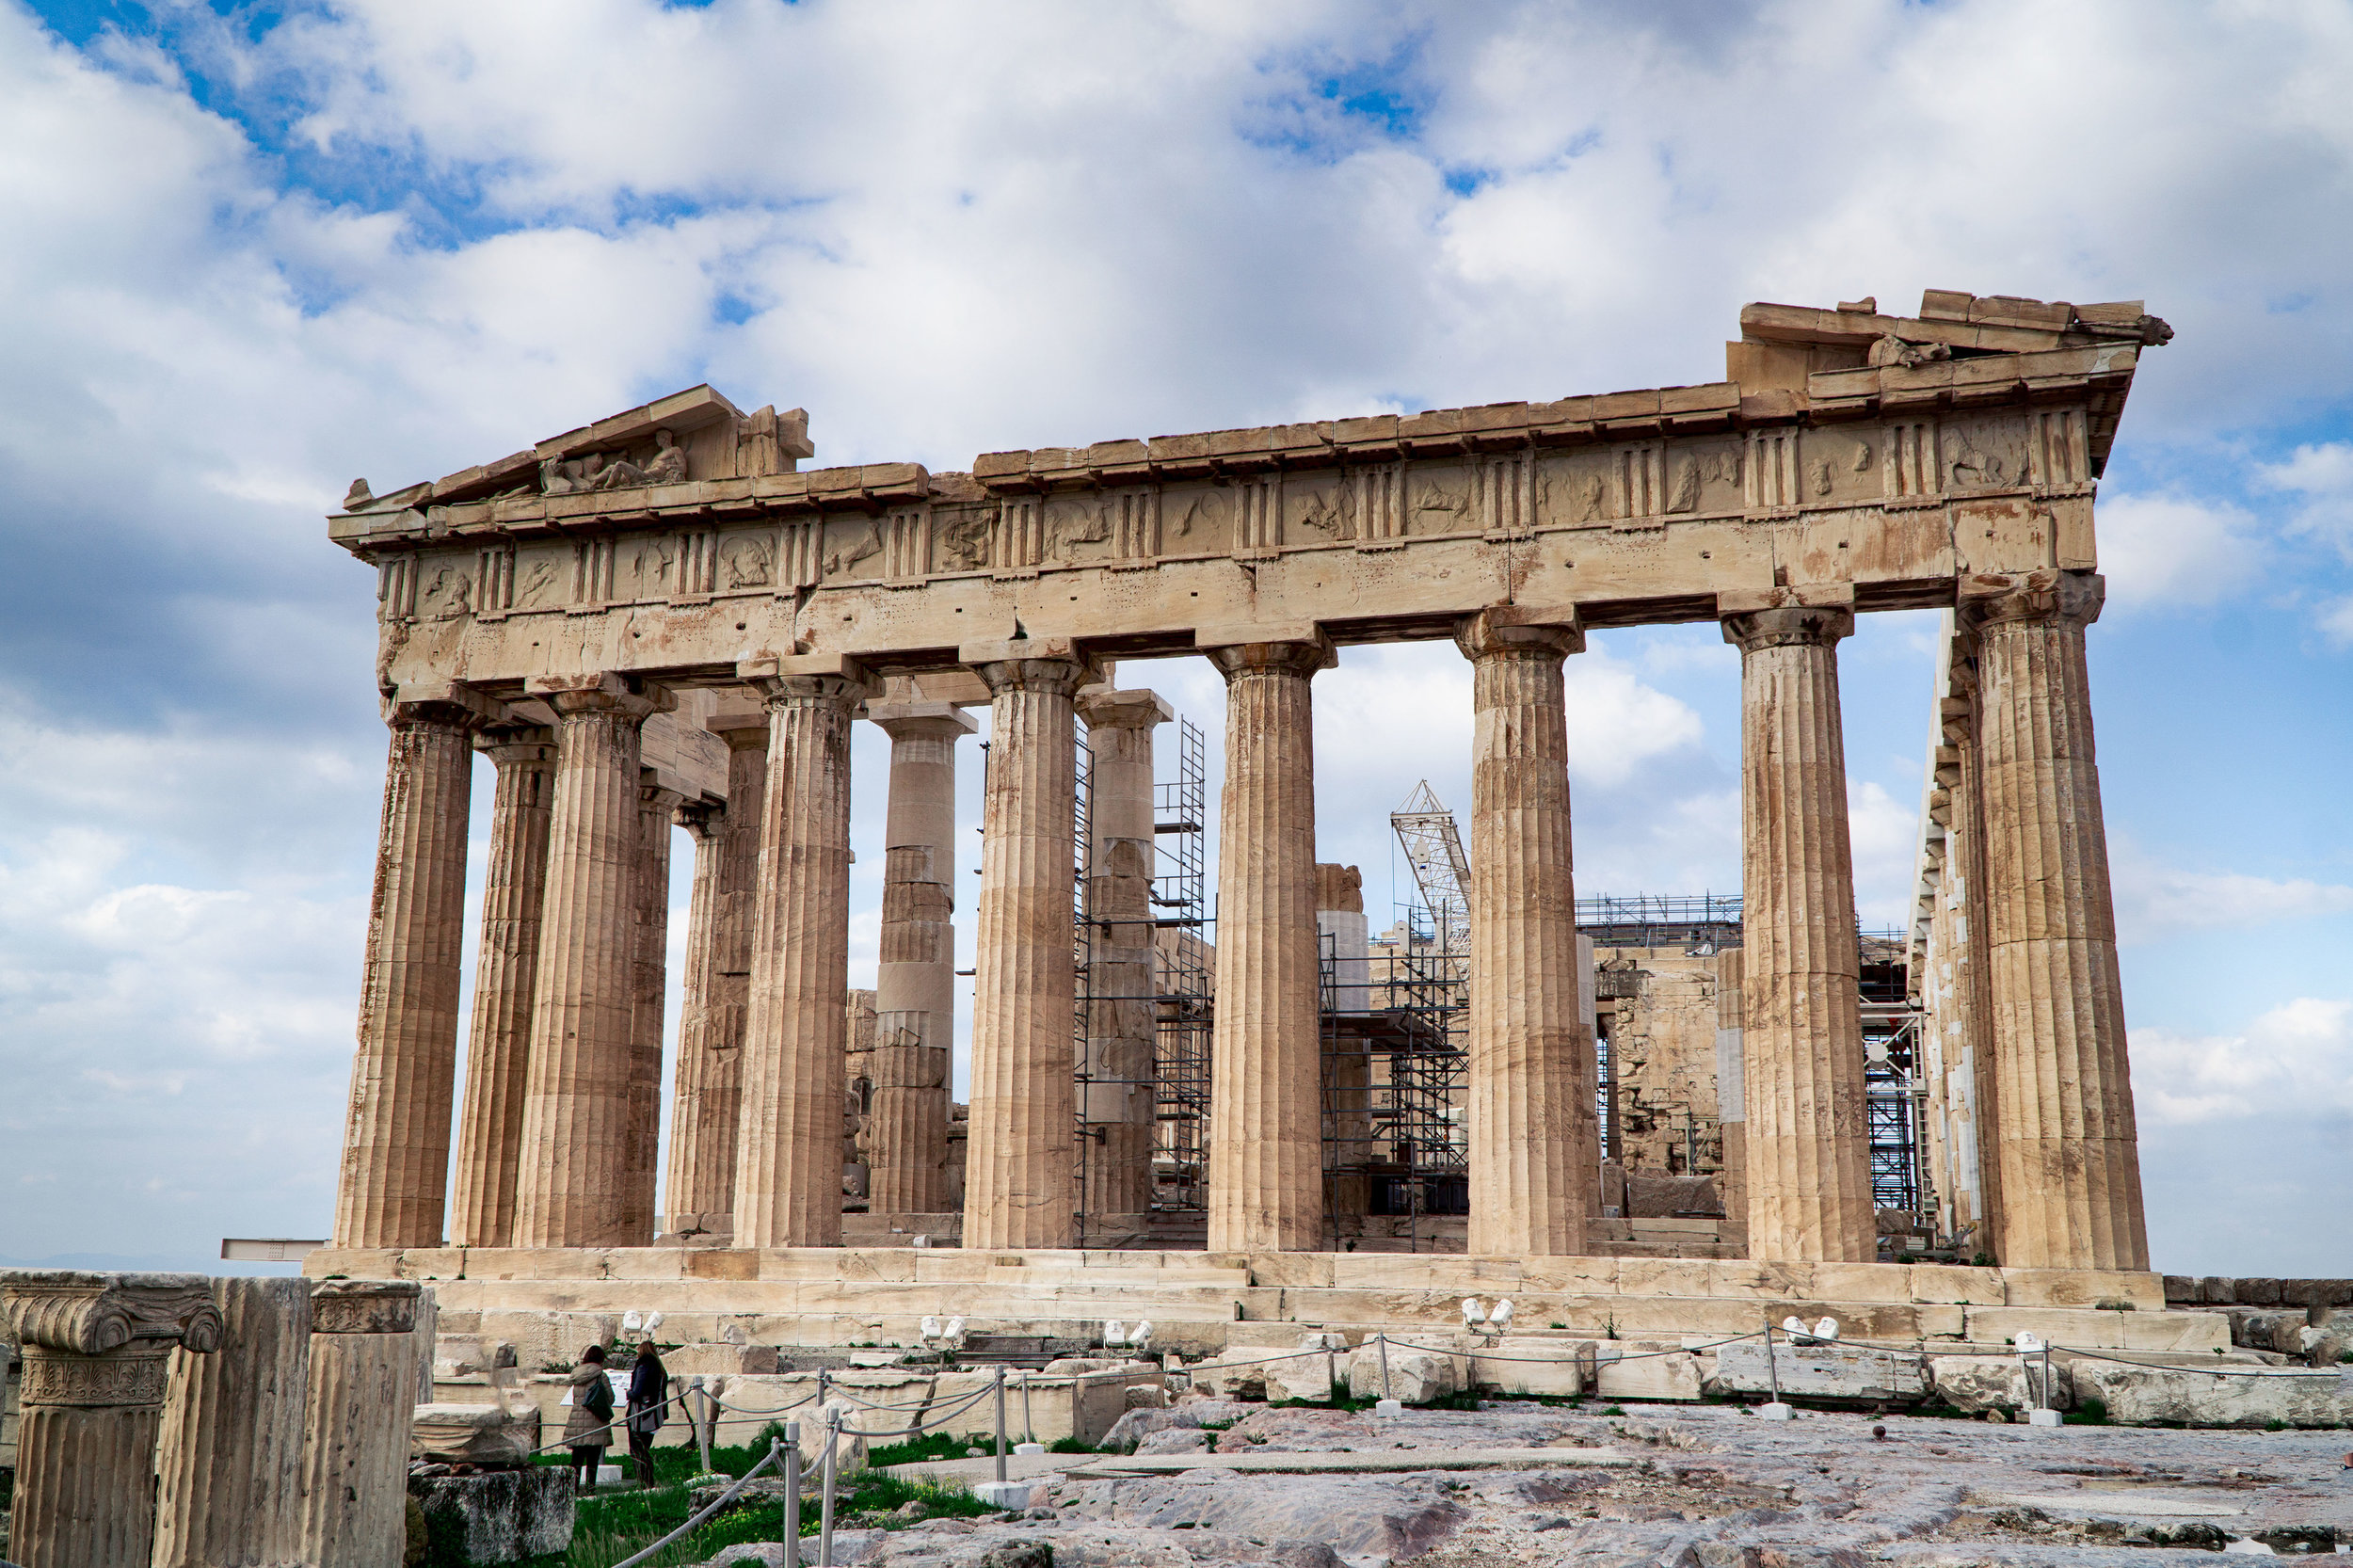 athens_acropolis_vickygood_travel_photography4sm.jpg